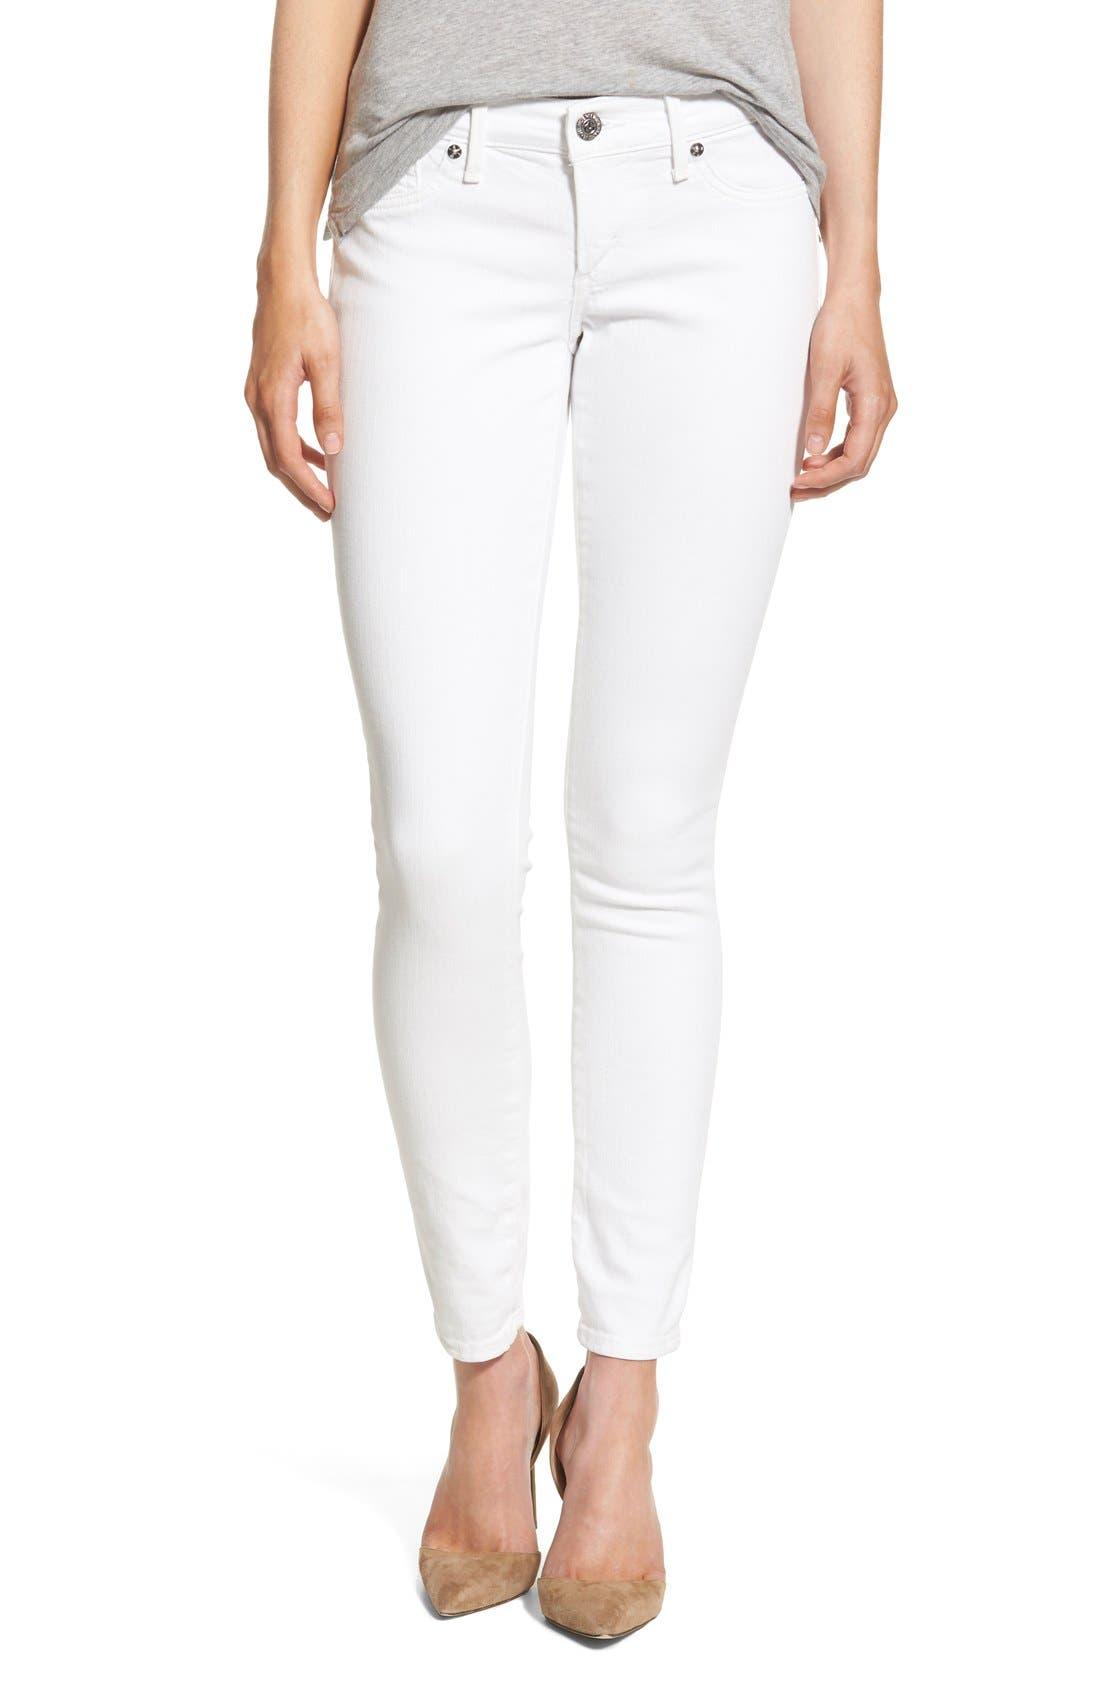 Main Image - True Religion Brand Jeans 'Casey' Flap Pocket Skinny Jeans (Optic White)